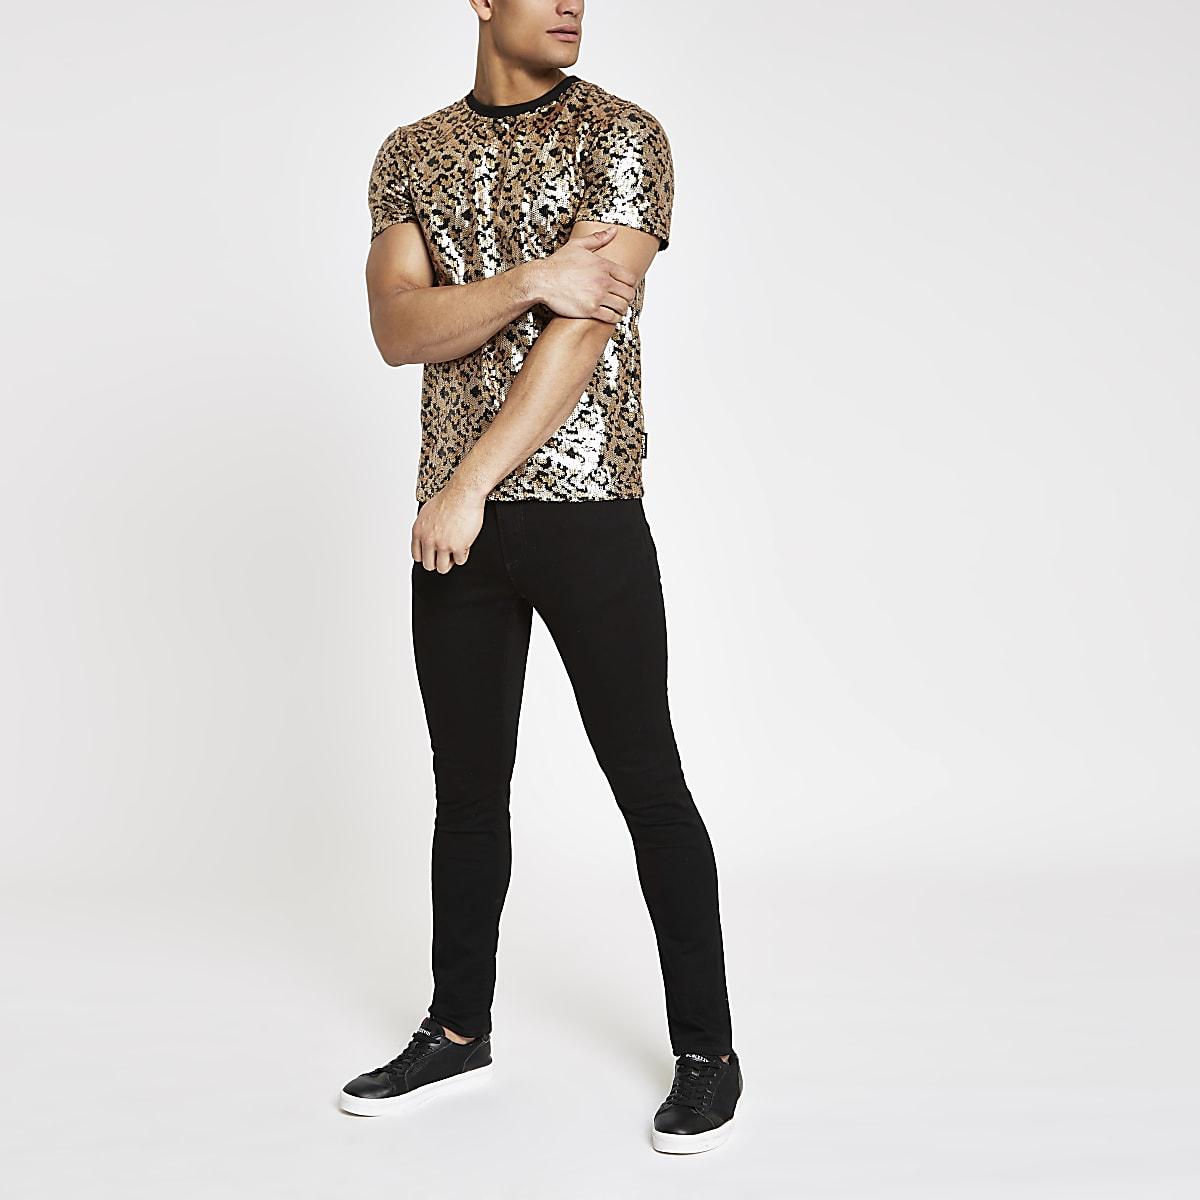 Jaded London black leopard sequin T-shirt